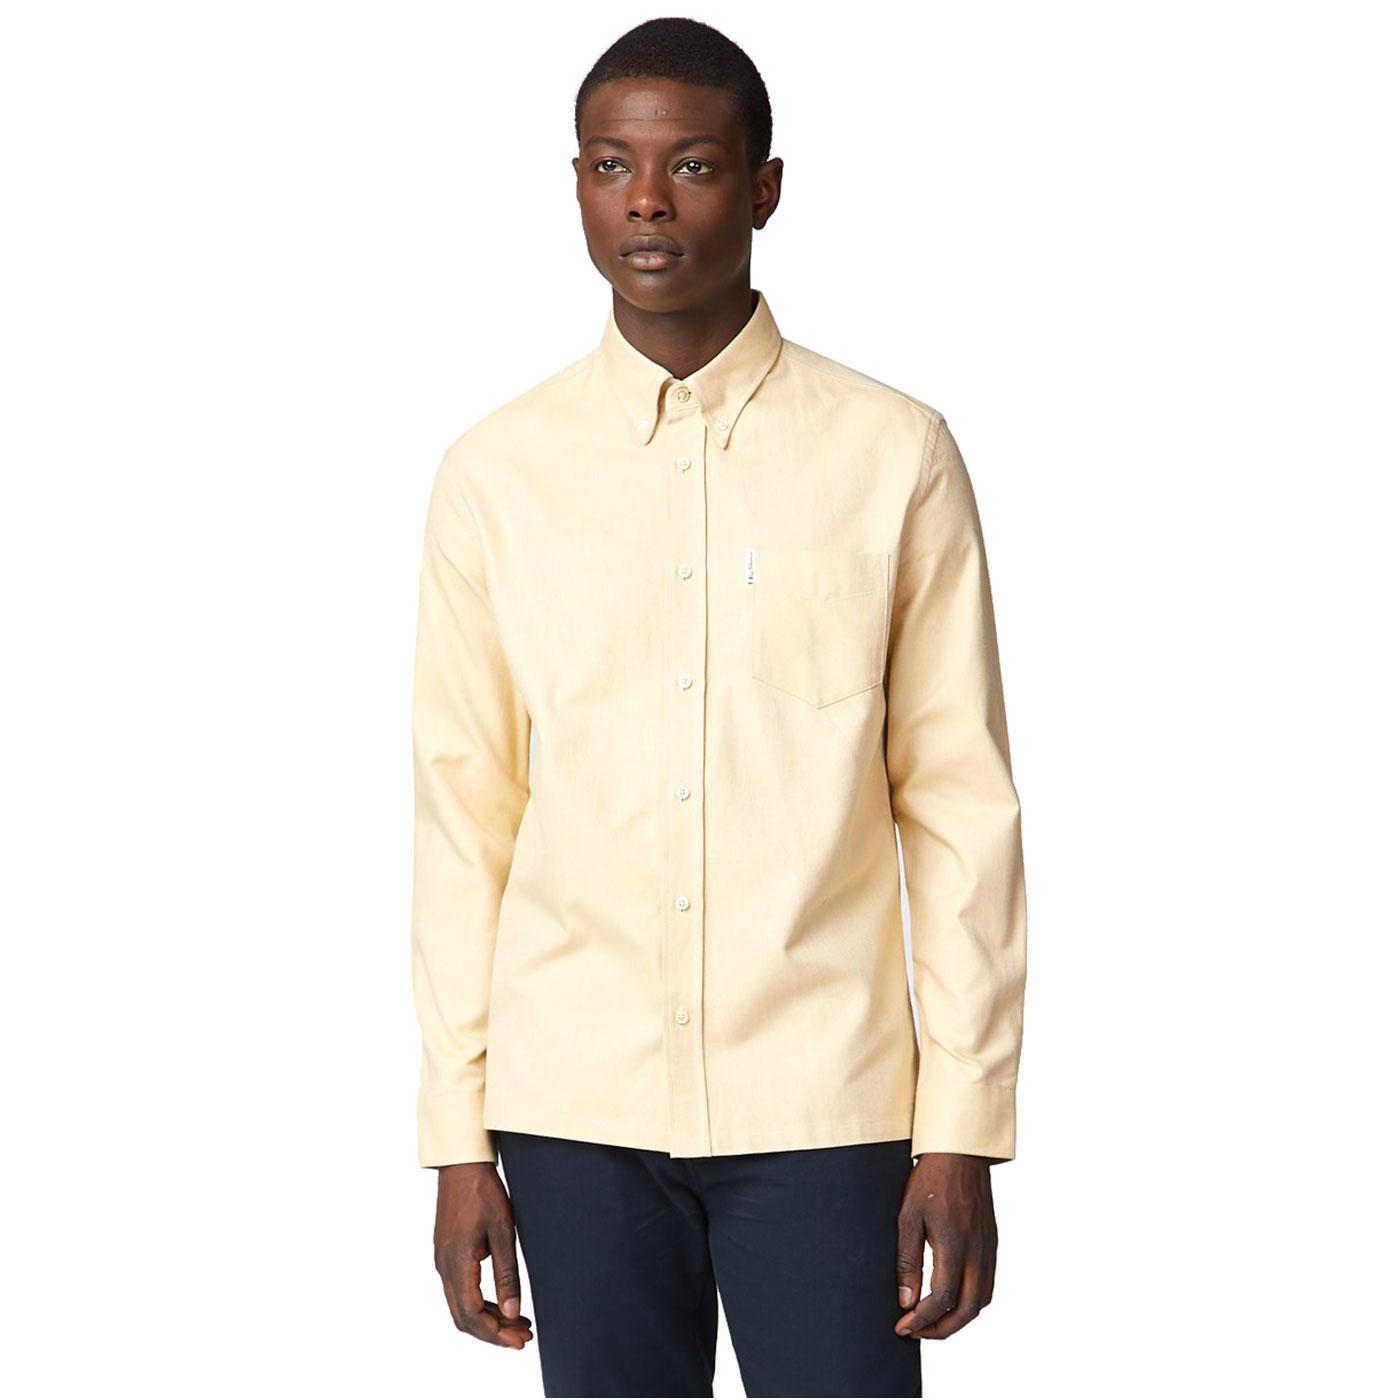 Benny BEN SHERMAN 60s Archive Heavy Oxford Shirt D